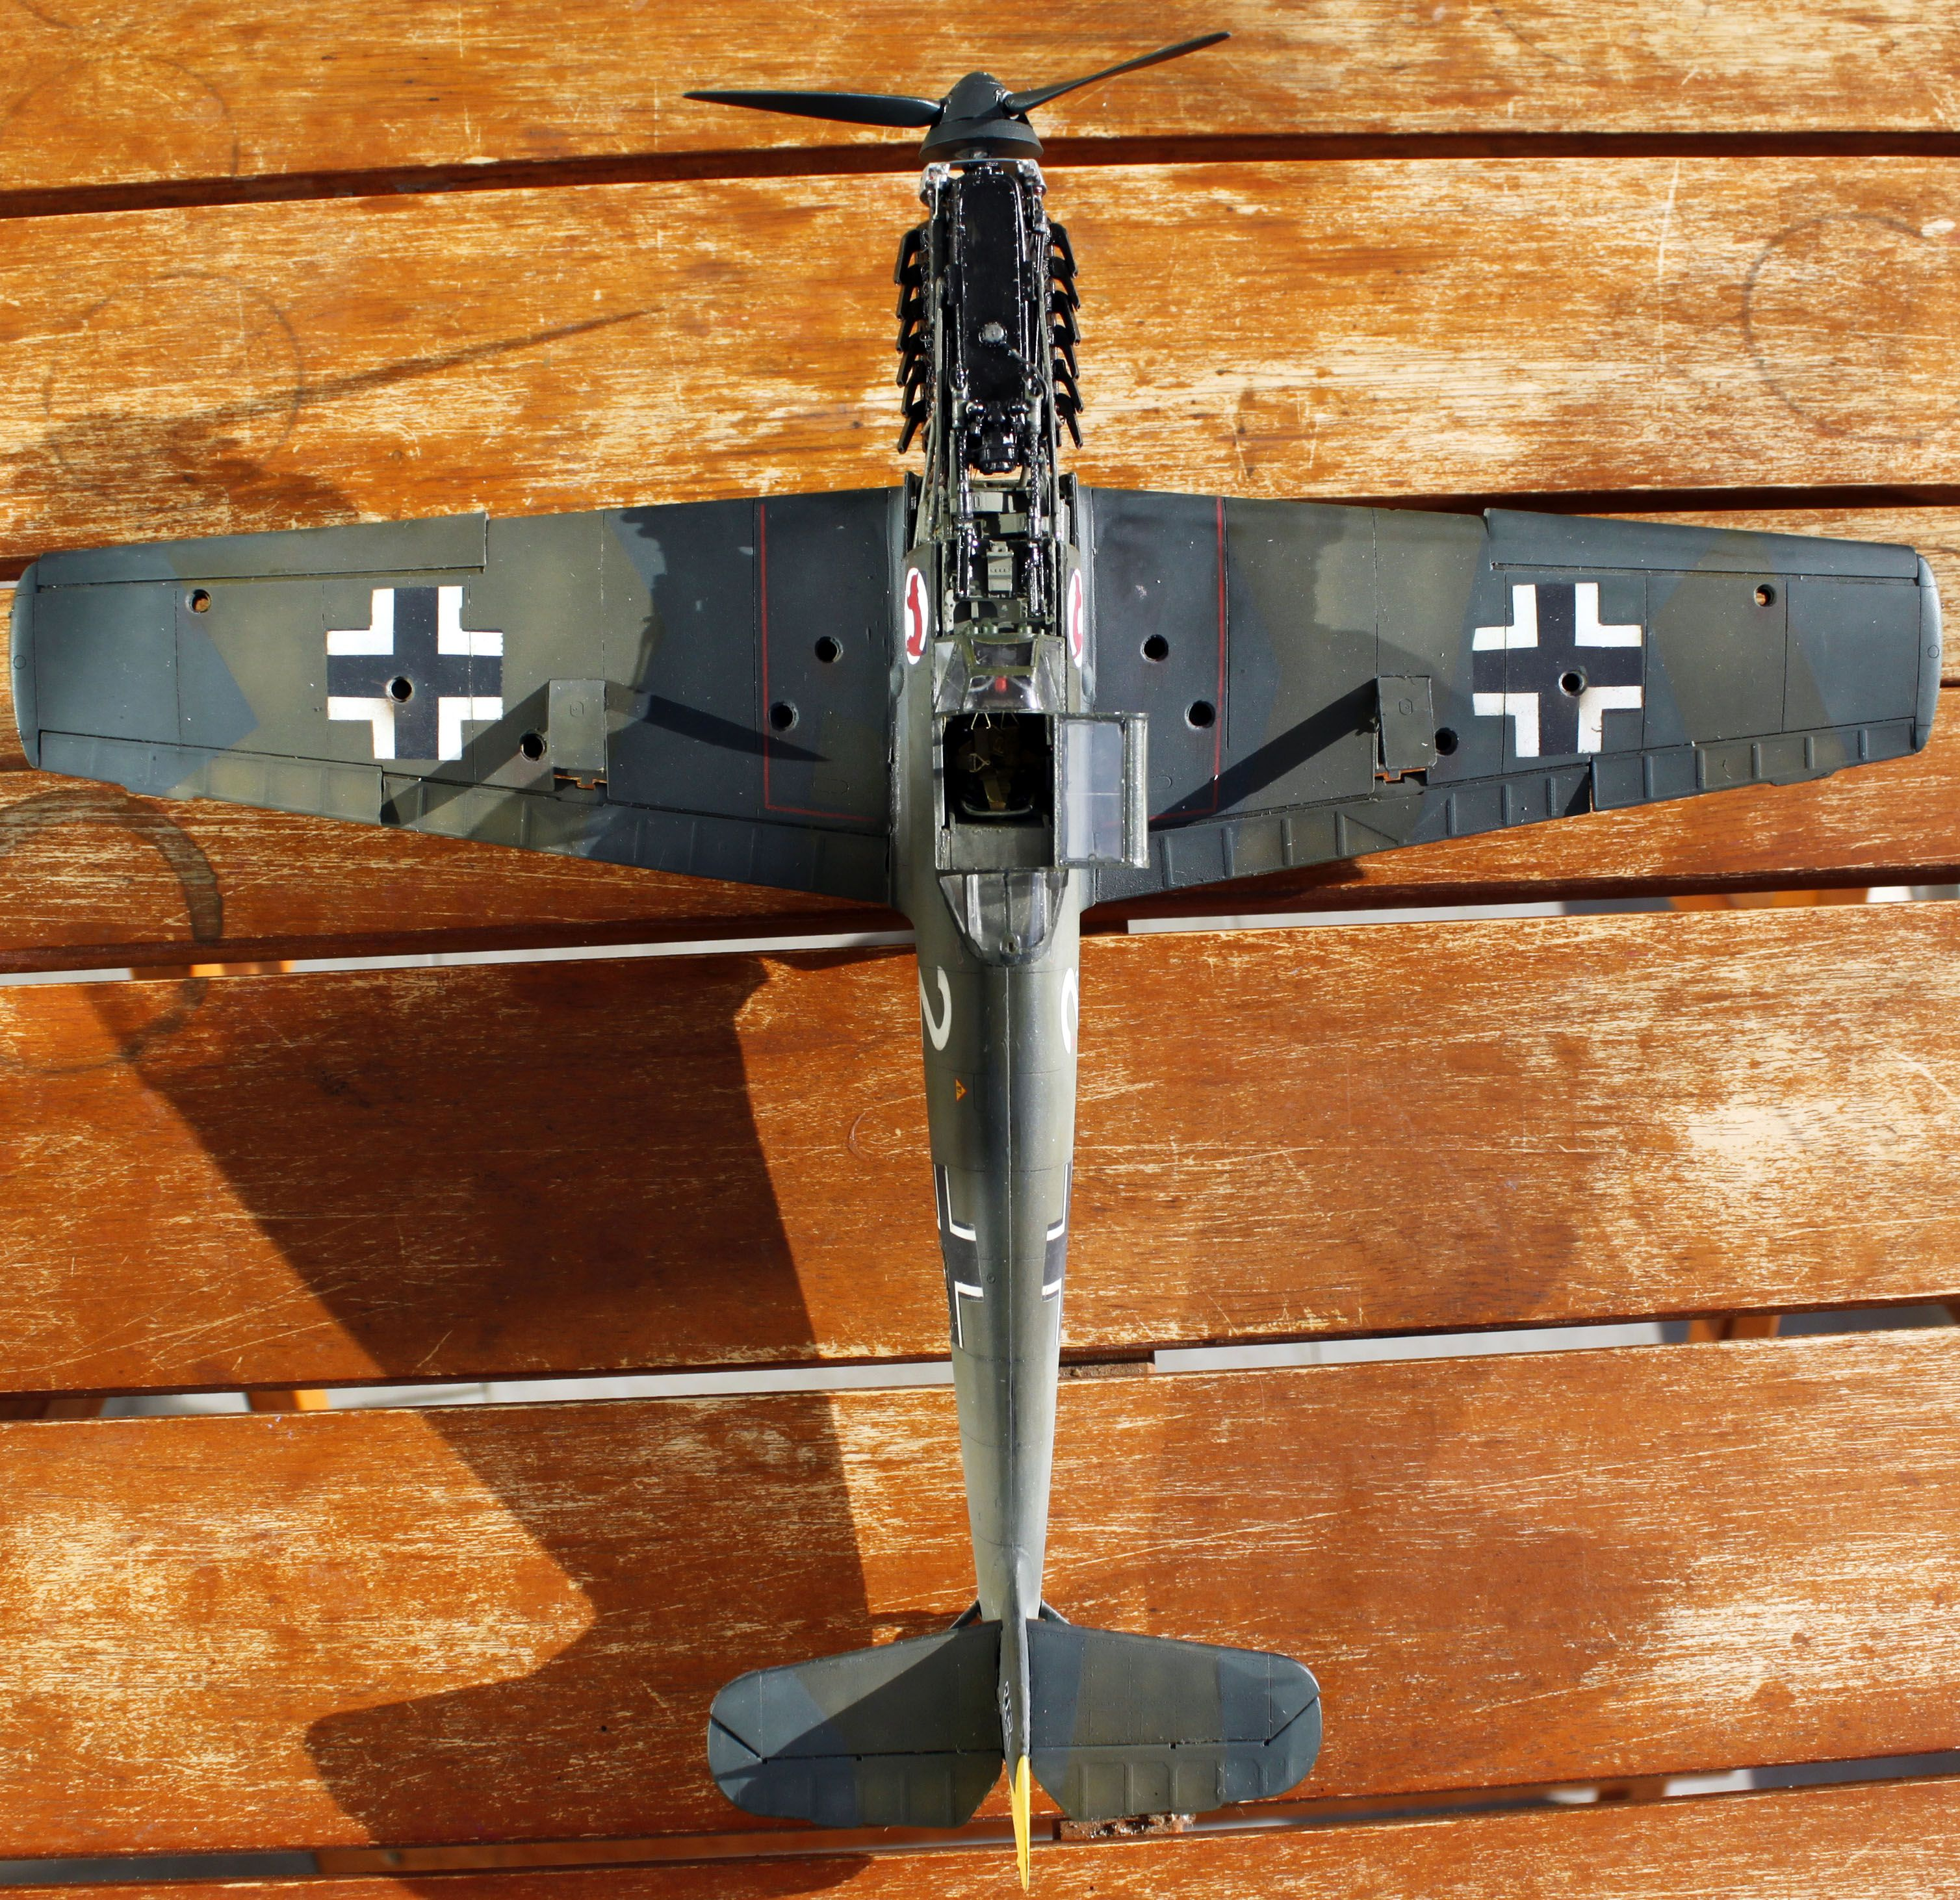 Me Bf 109 E1  [ Eduard 1/32 ] - Page 5 XzqVWU